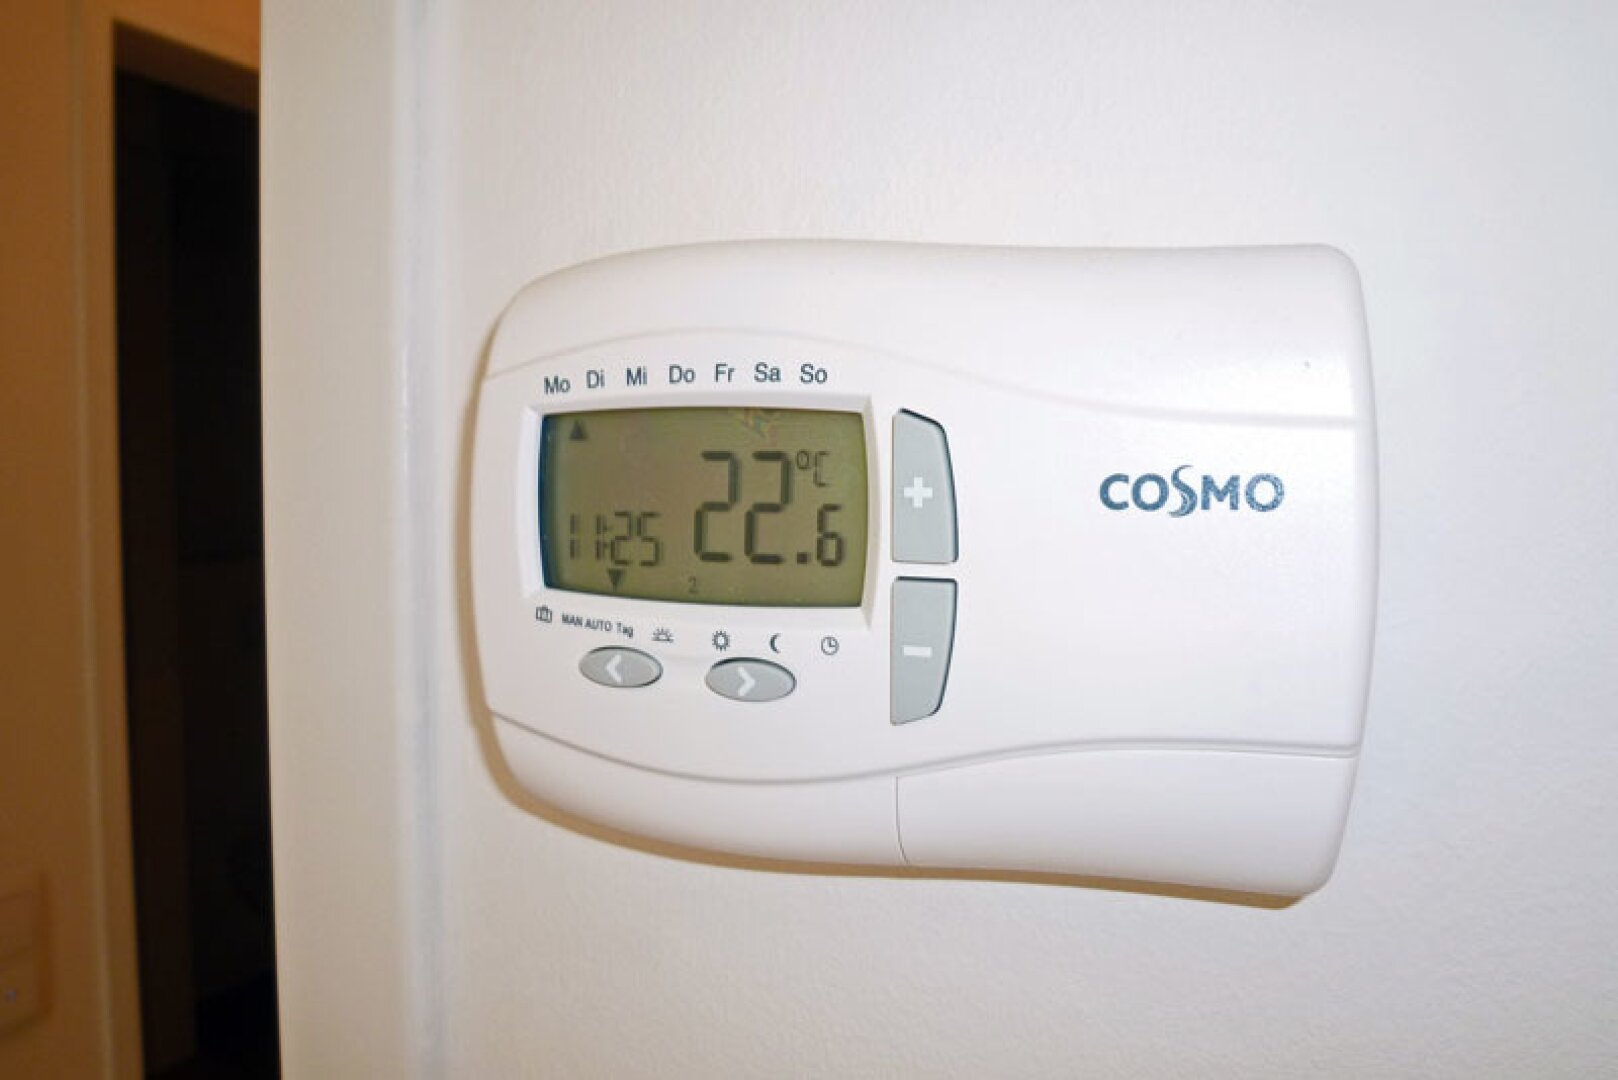 P1060766 - PS